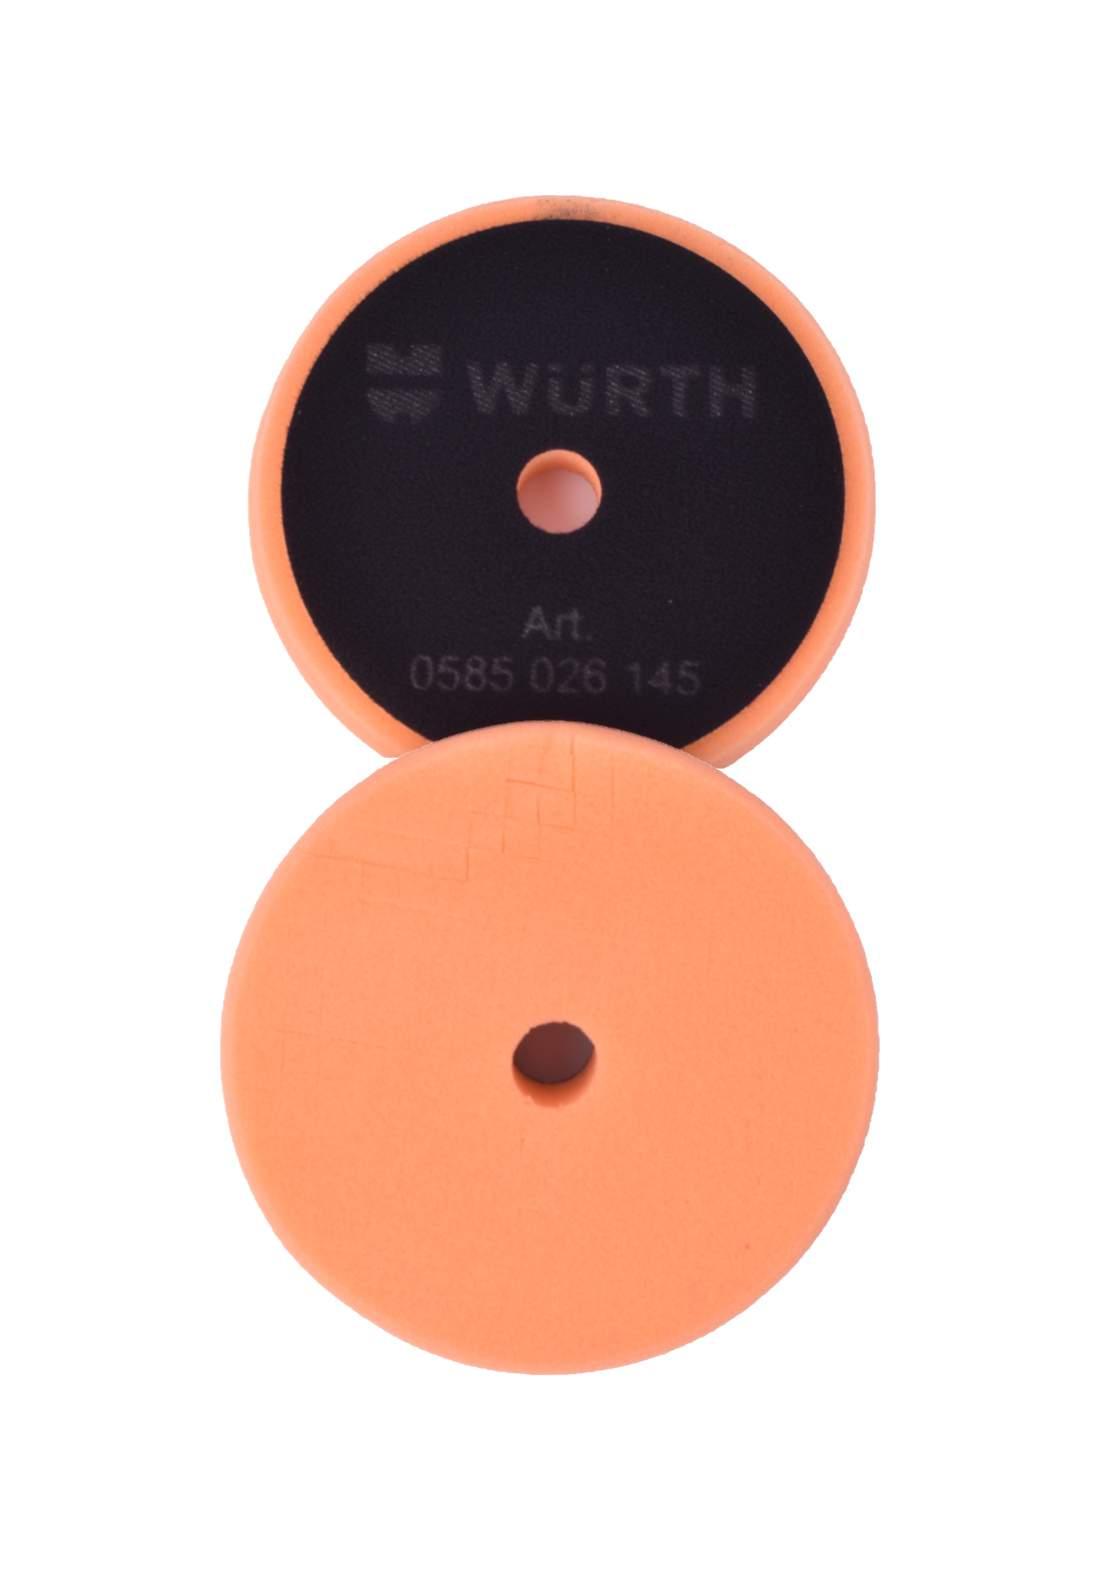 Wurth 585026170 Polishing Sponge Spider Web Orange Soft  اسفنجة بوليش ناعمة